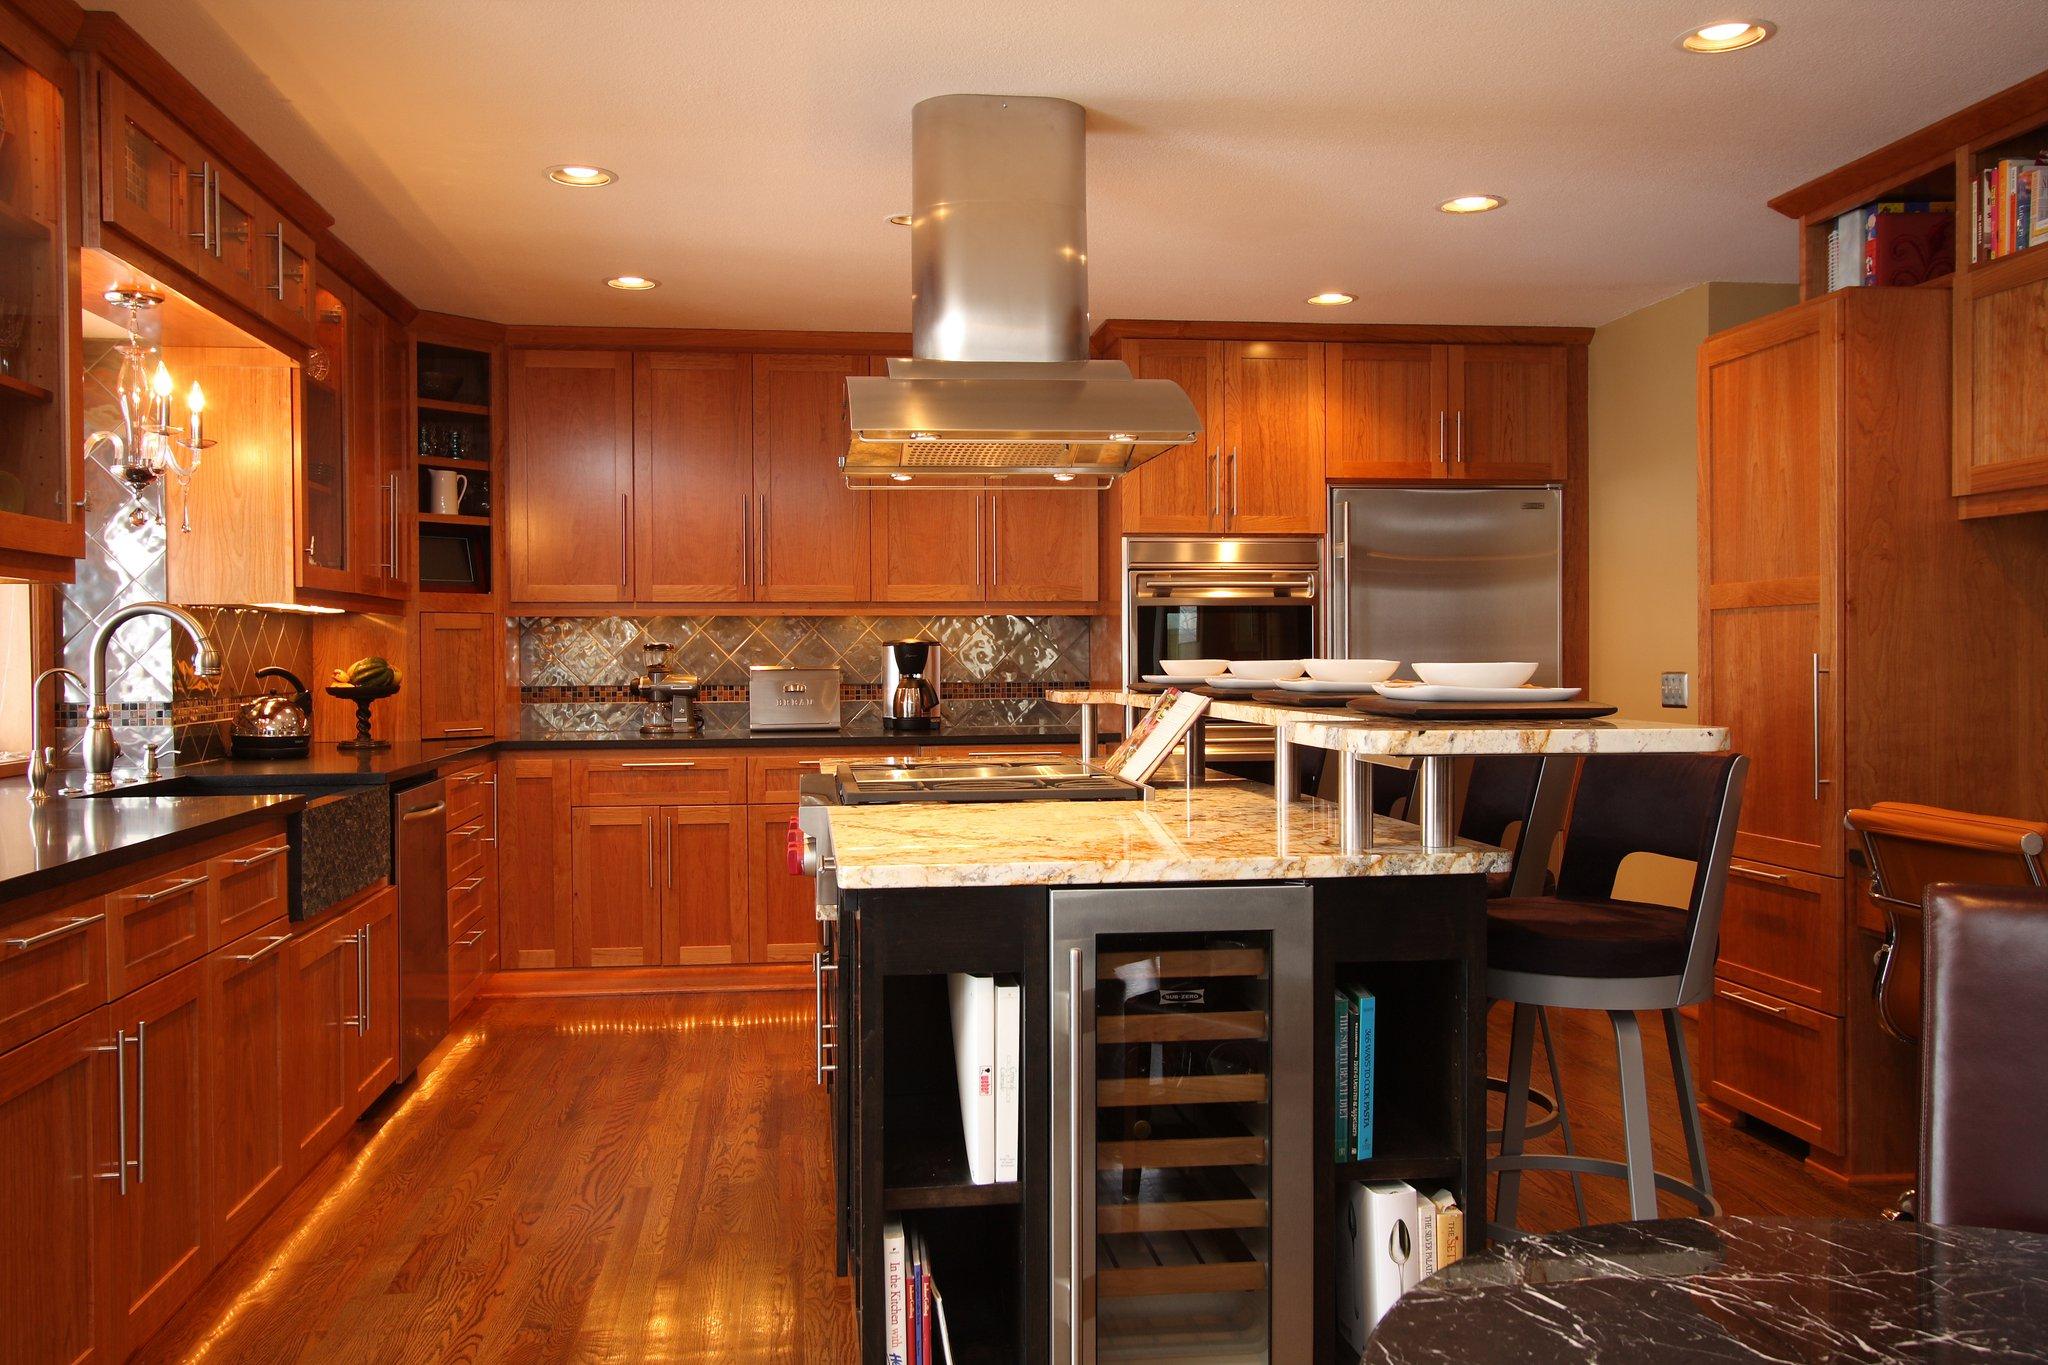 mn custom kitchen cabinets and countertops custom kitchen island custom kitchen islands The Kitchen Island Custom